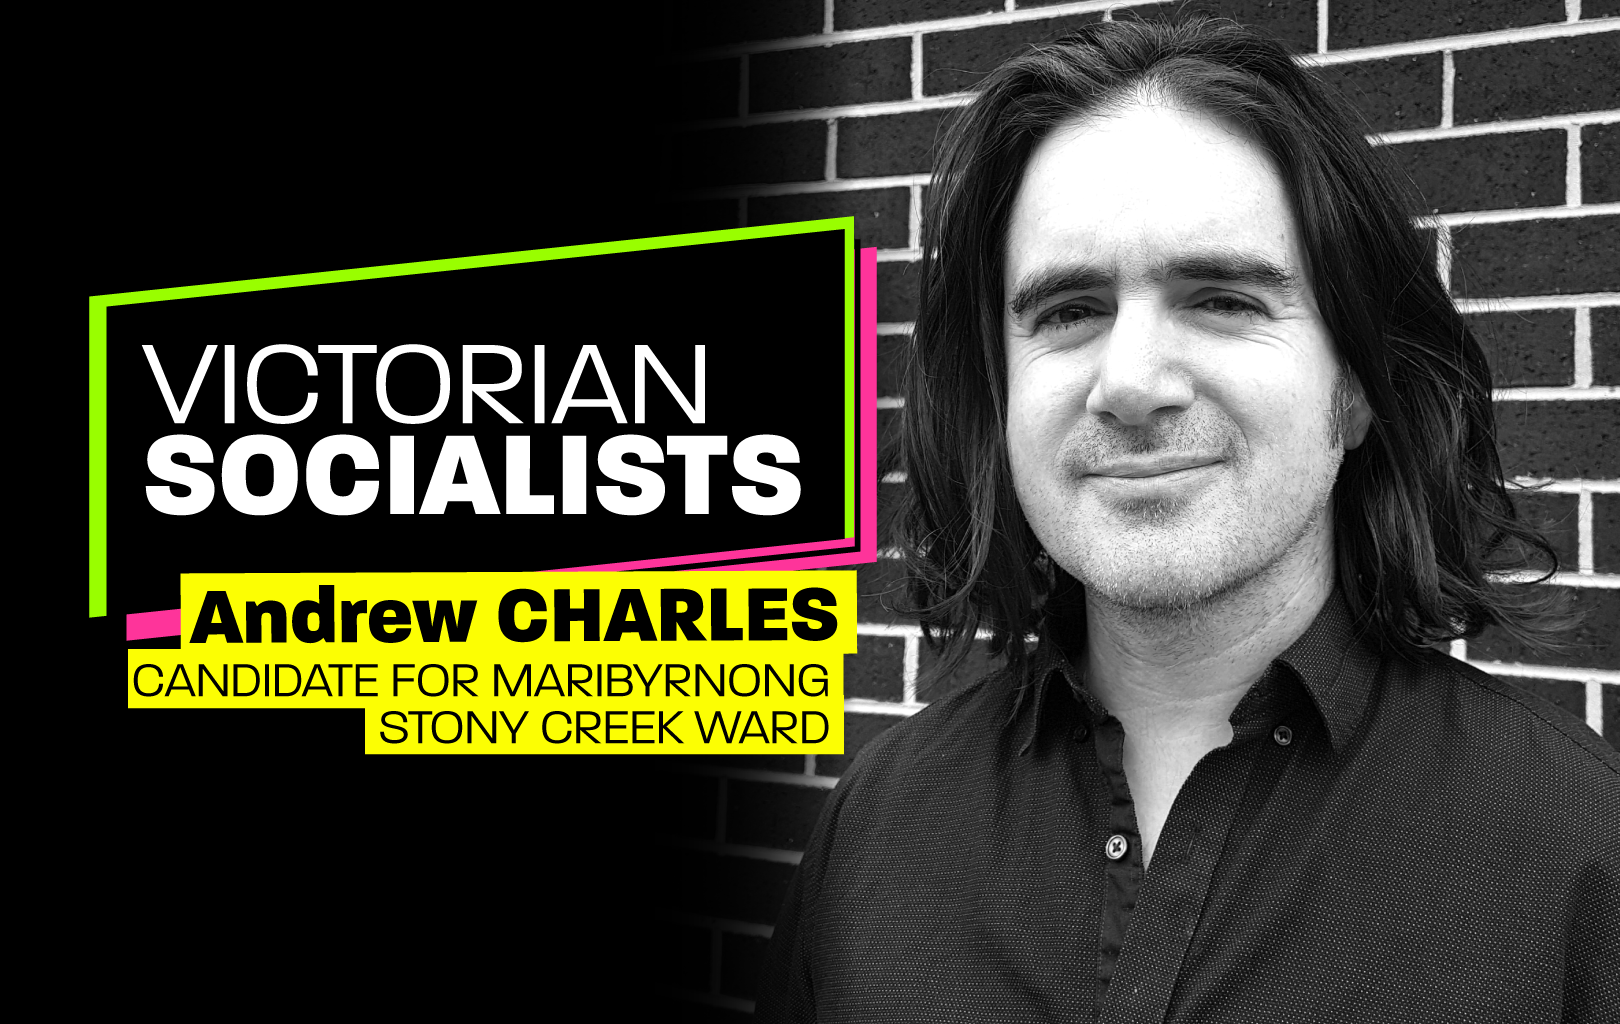 Andrew Charles